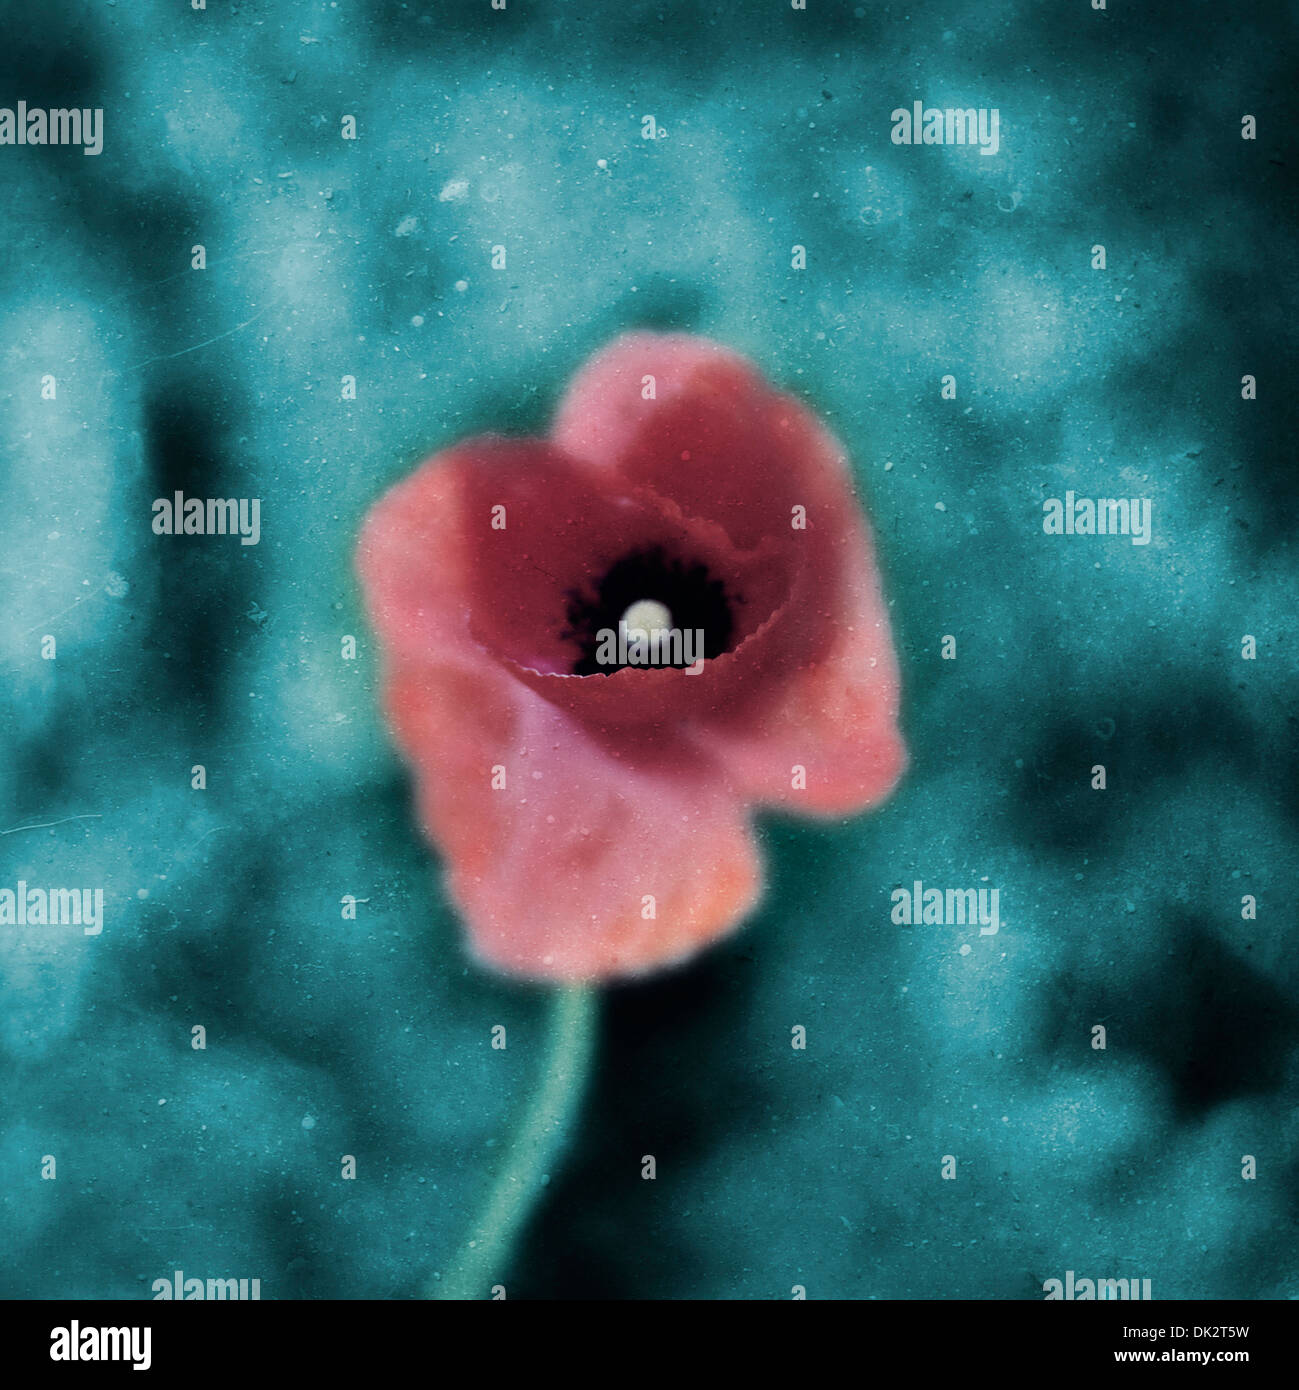 Poppy close-up - Stock Image